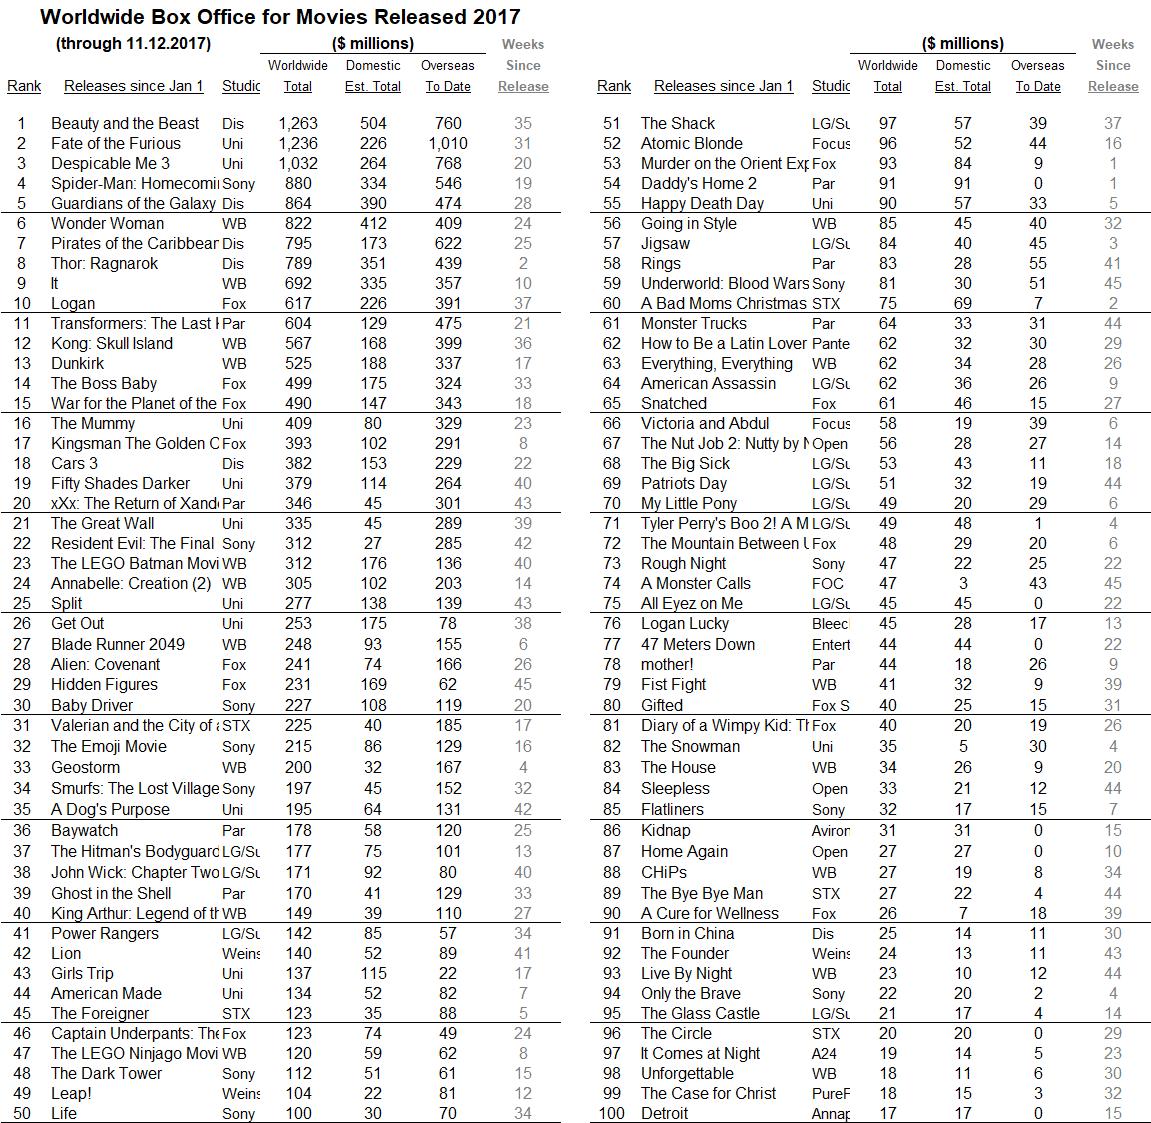 International 2017 through 2017 Nov 12